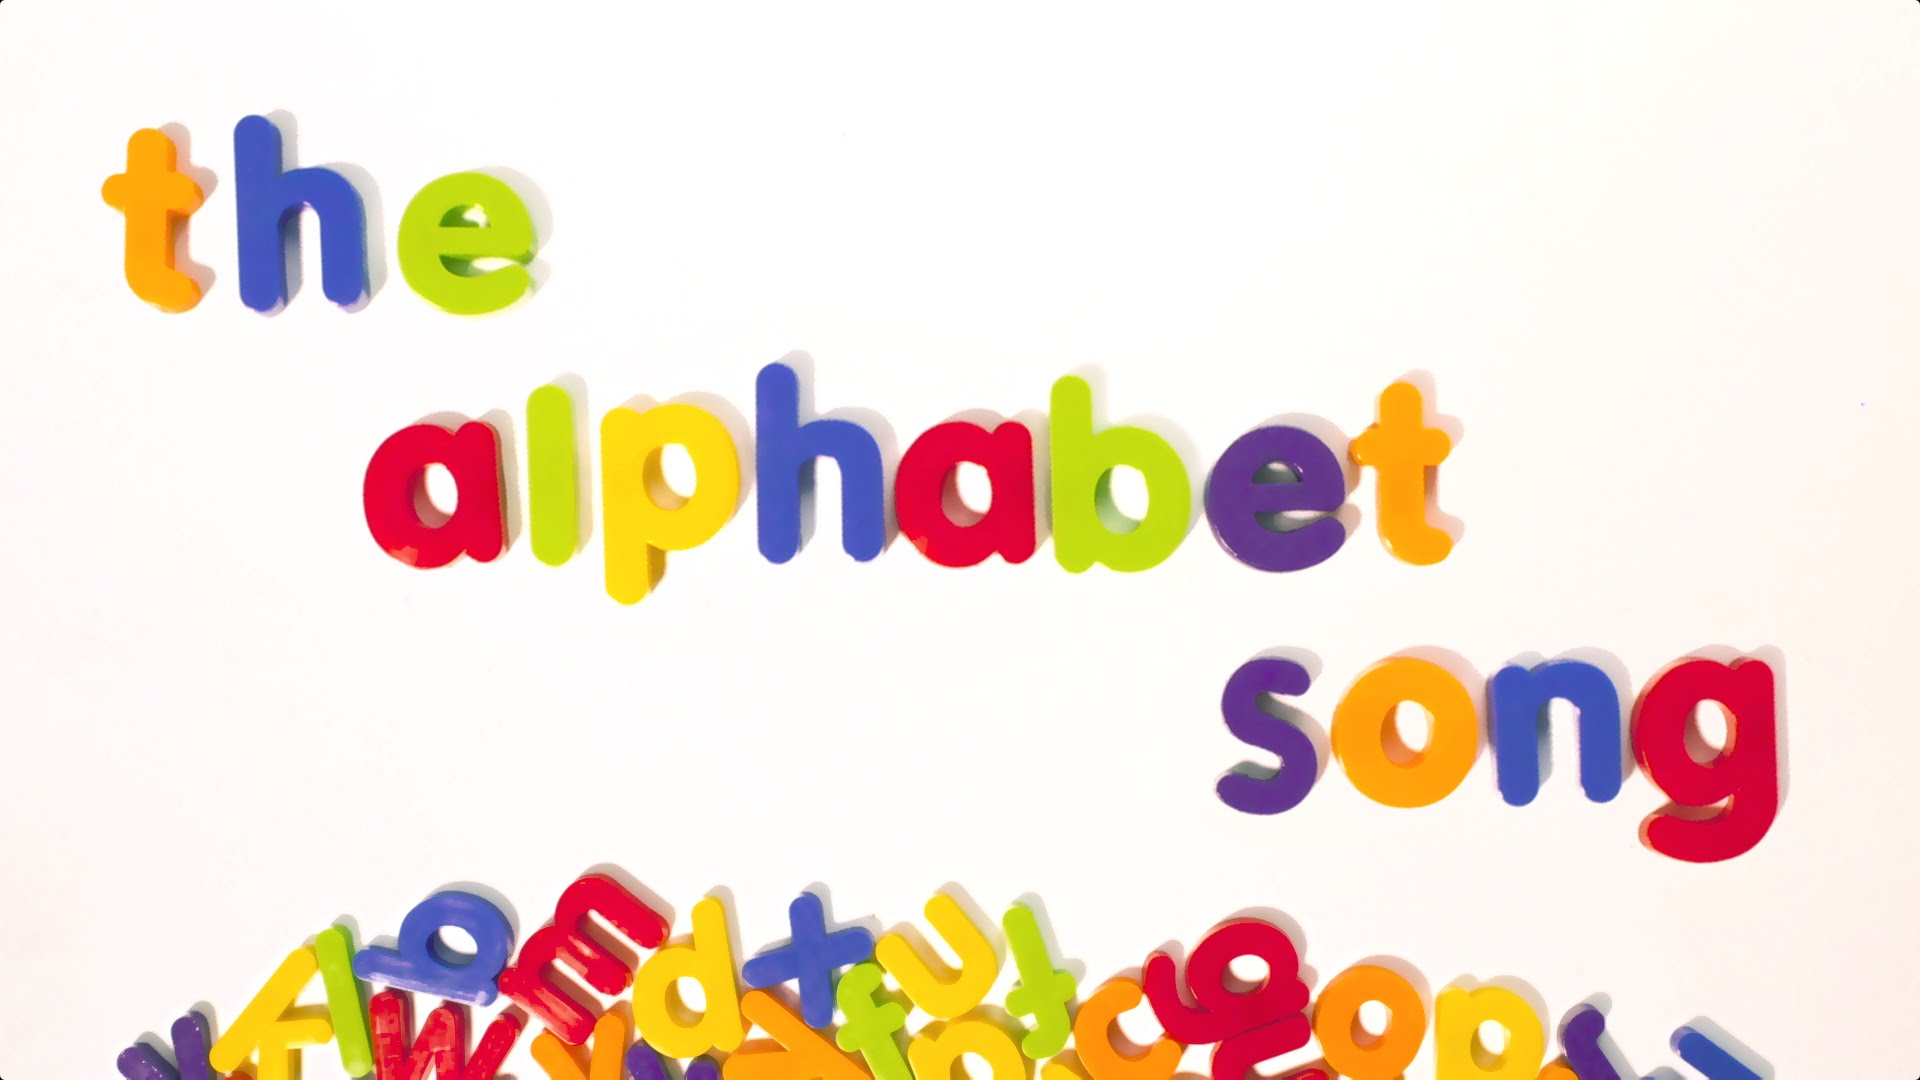 the alphabet song lama gee ළම ග